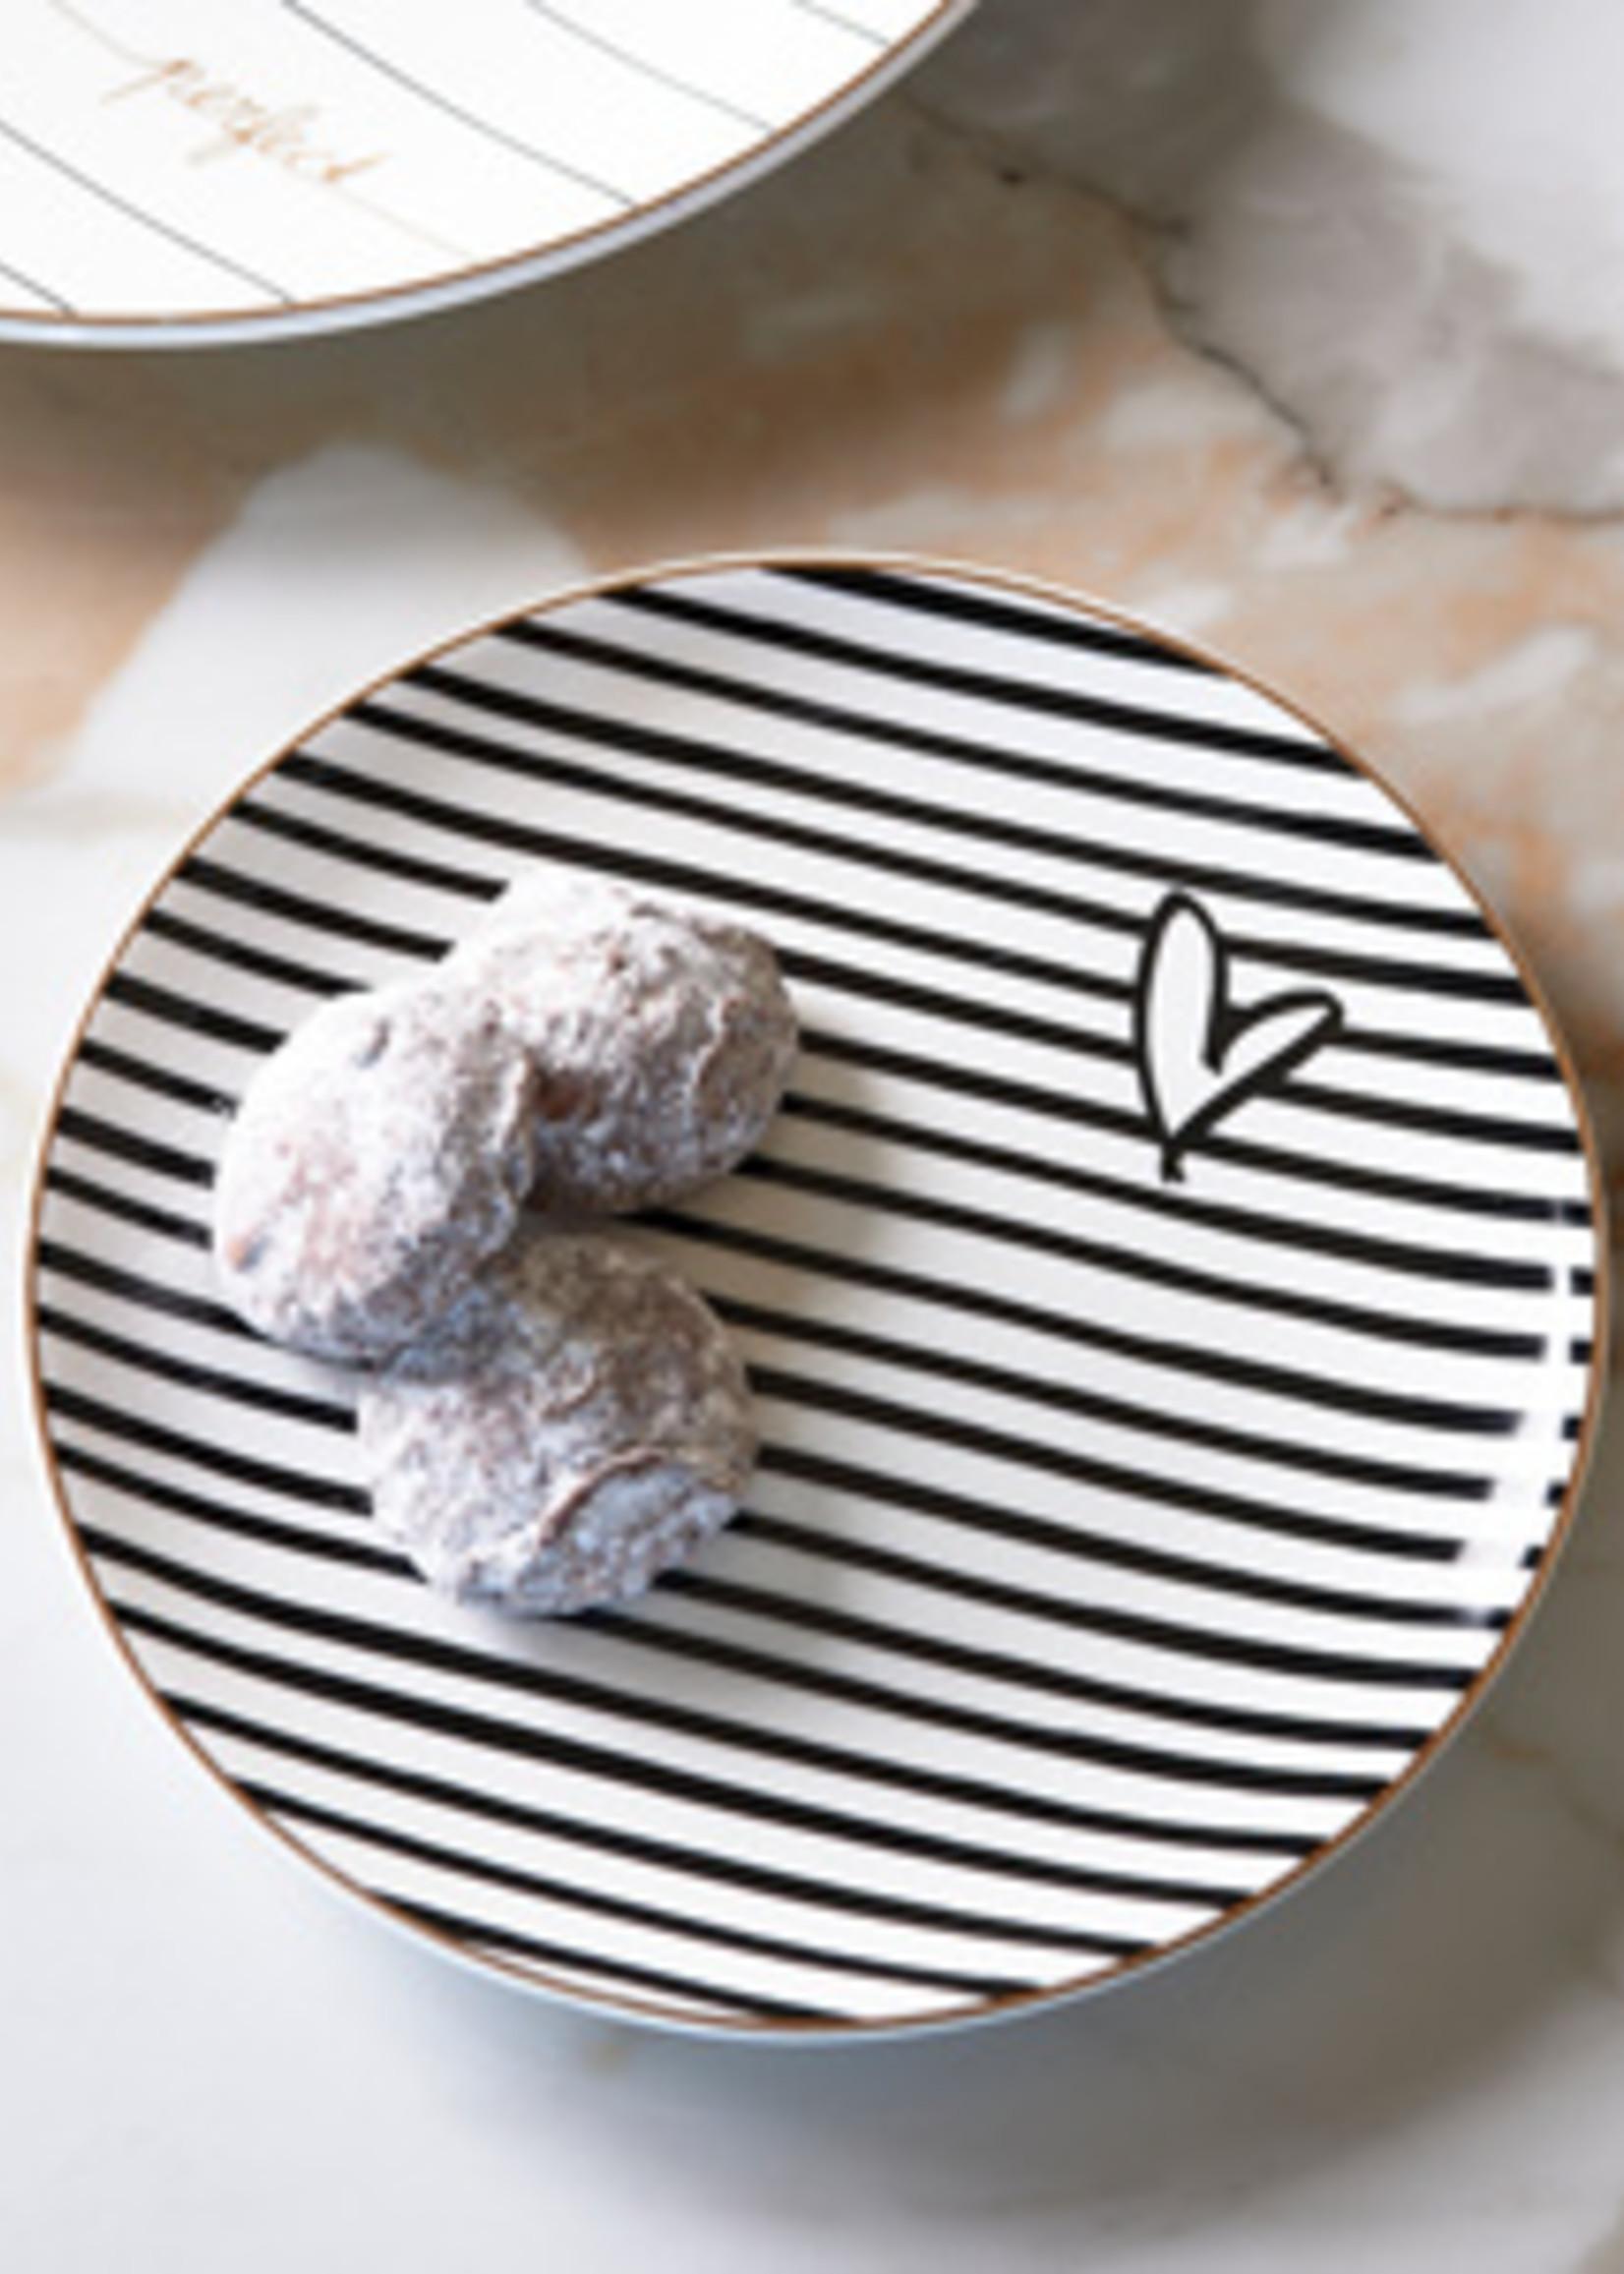 Riviera Maison Dots & Stripes Heart Cake Plate